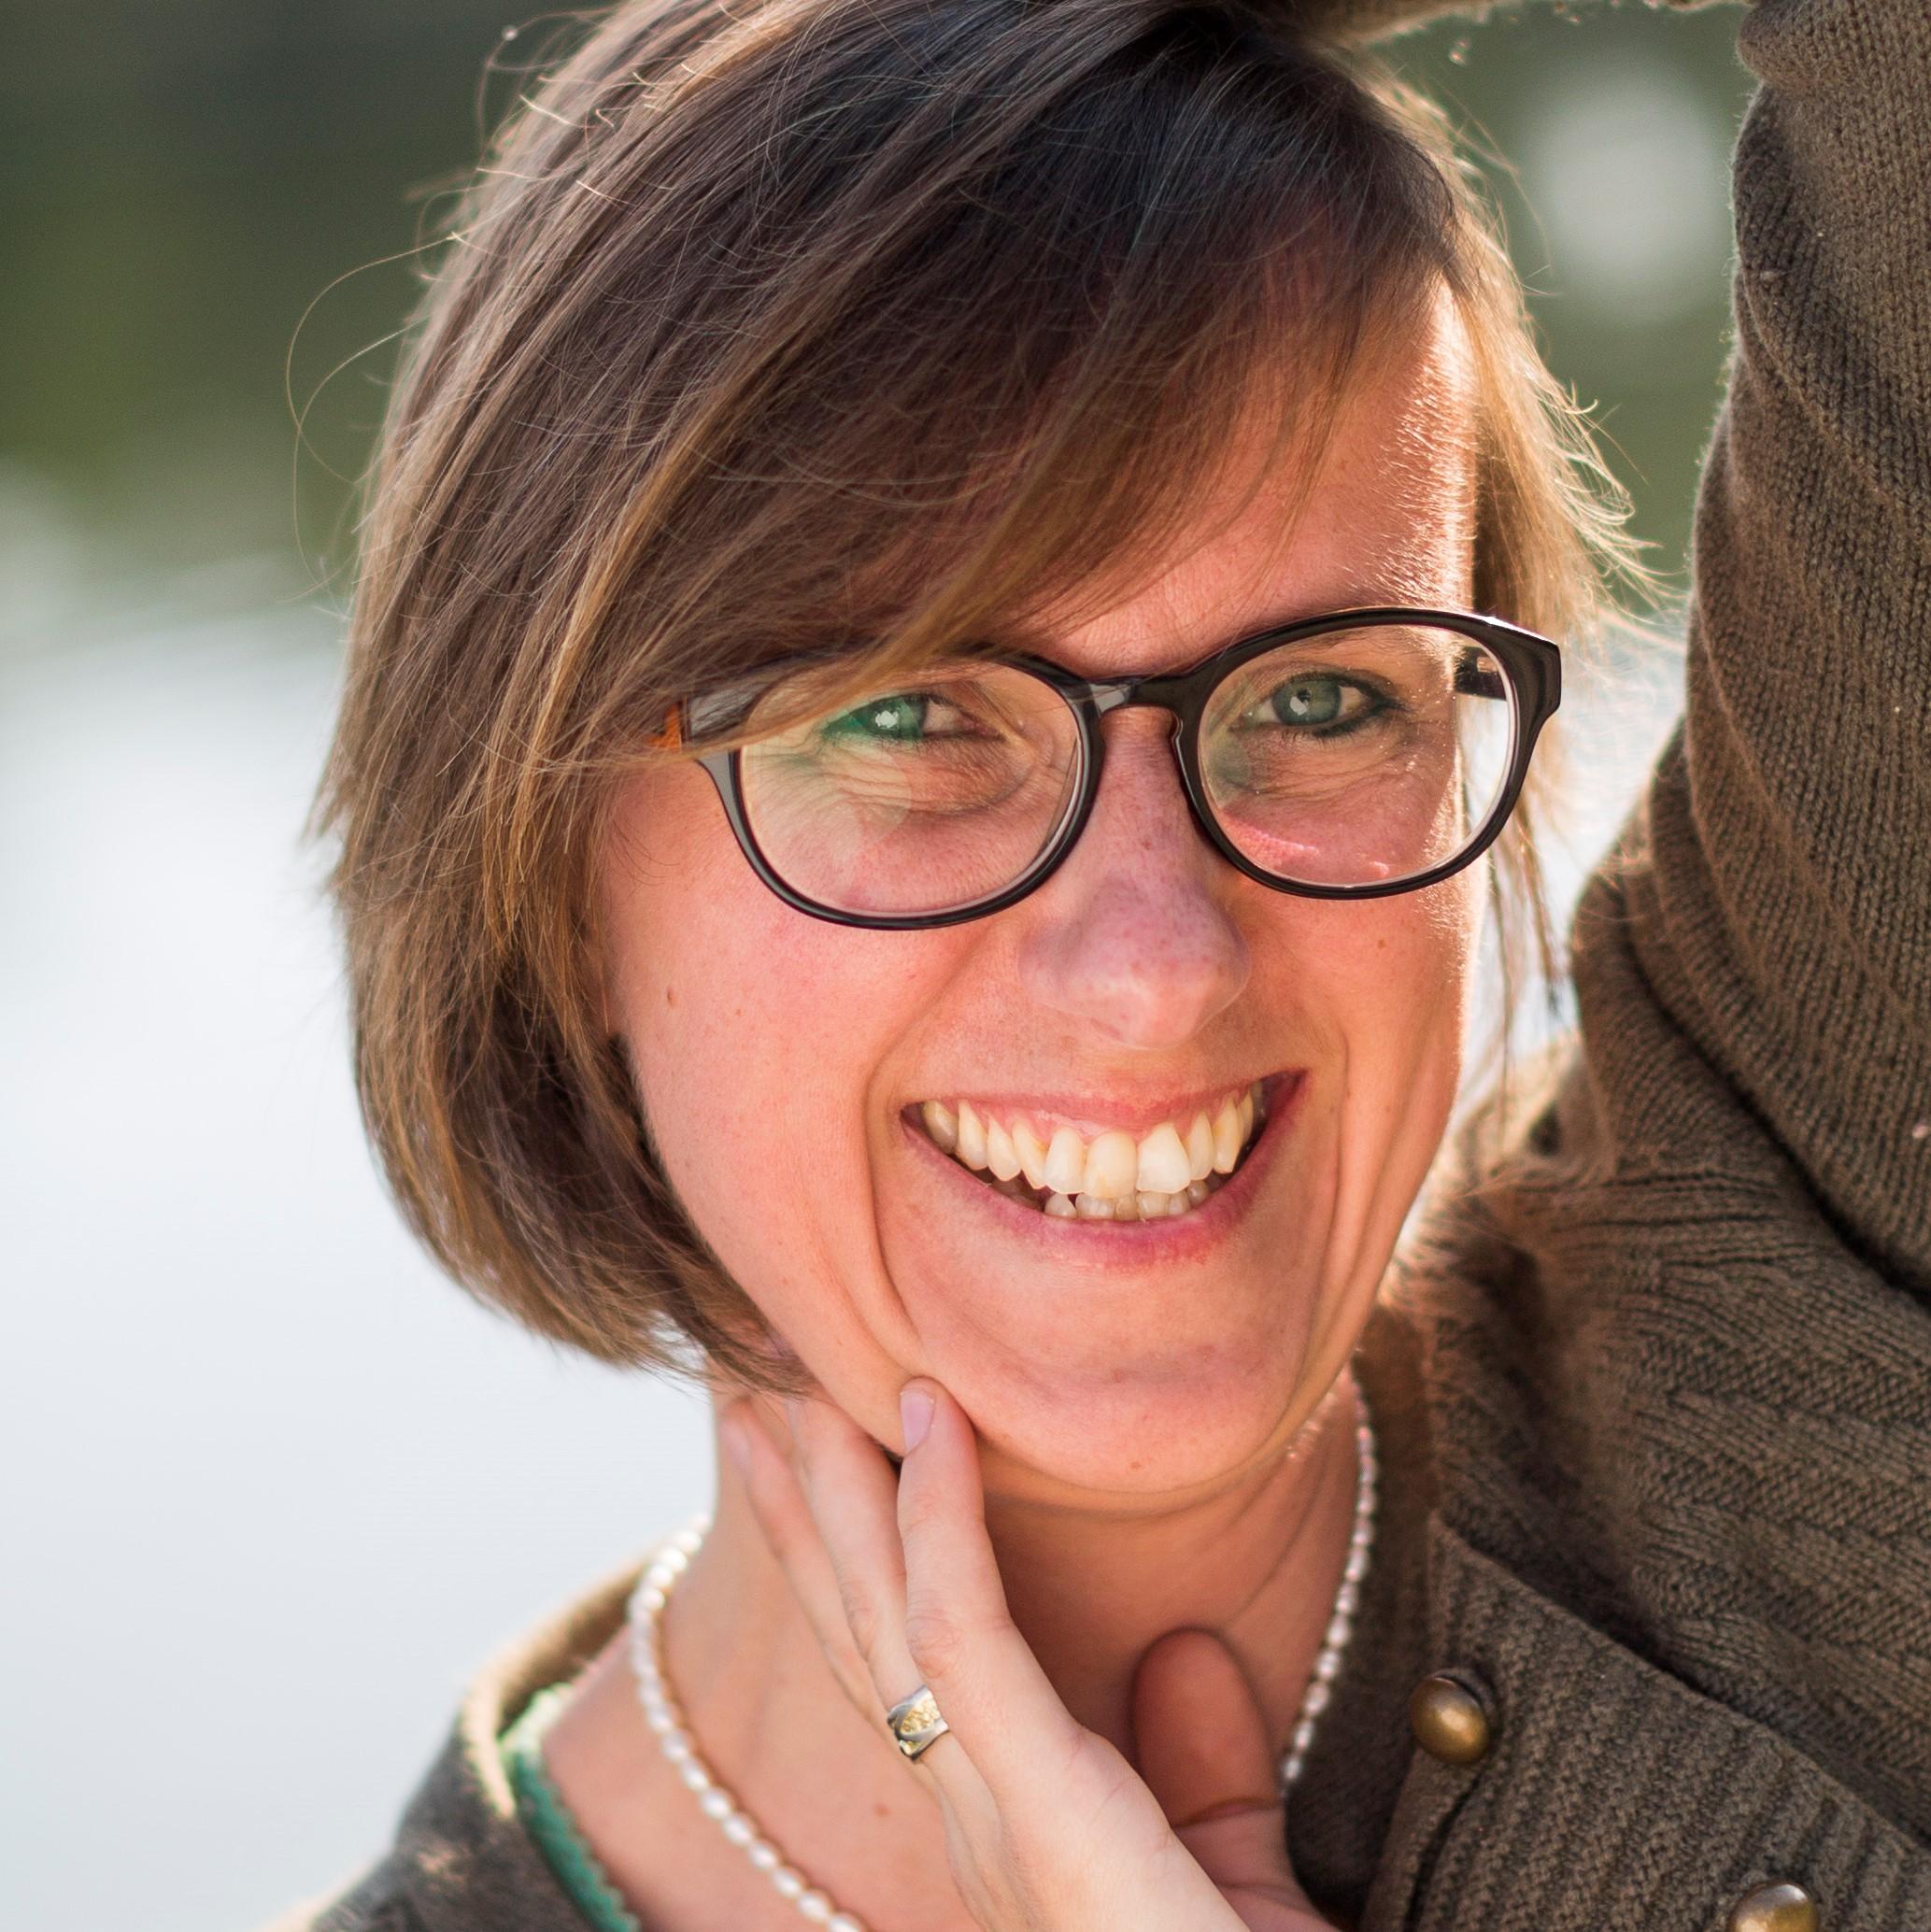 Pasfoto - Iris Kleinlugtenbelt